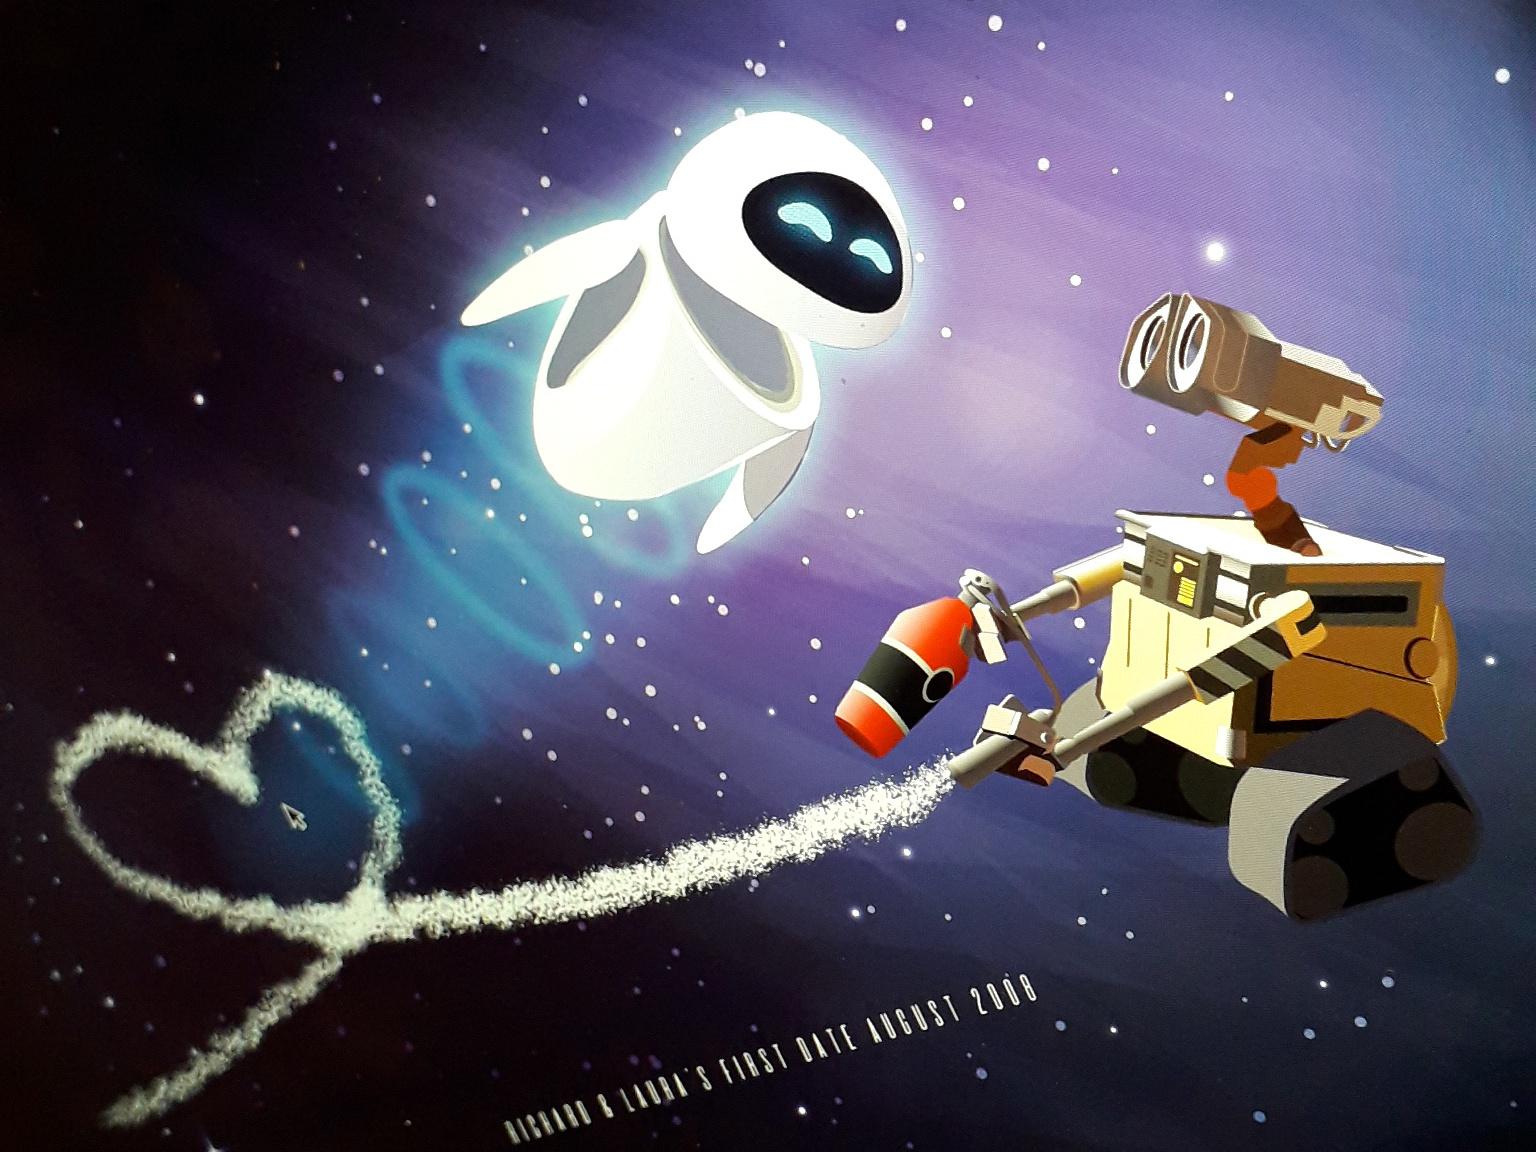 WALL•E AND EVE pixar fan art illustration uk illustrator walle disney fan art disney art disney